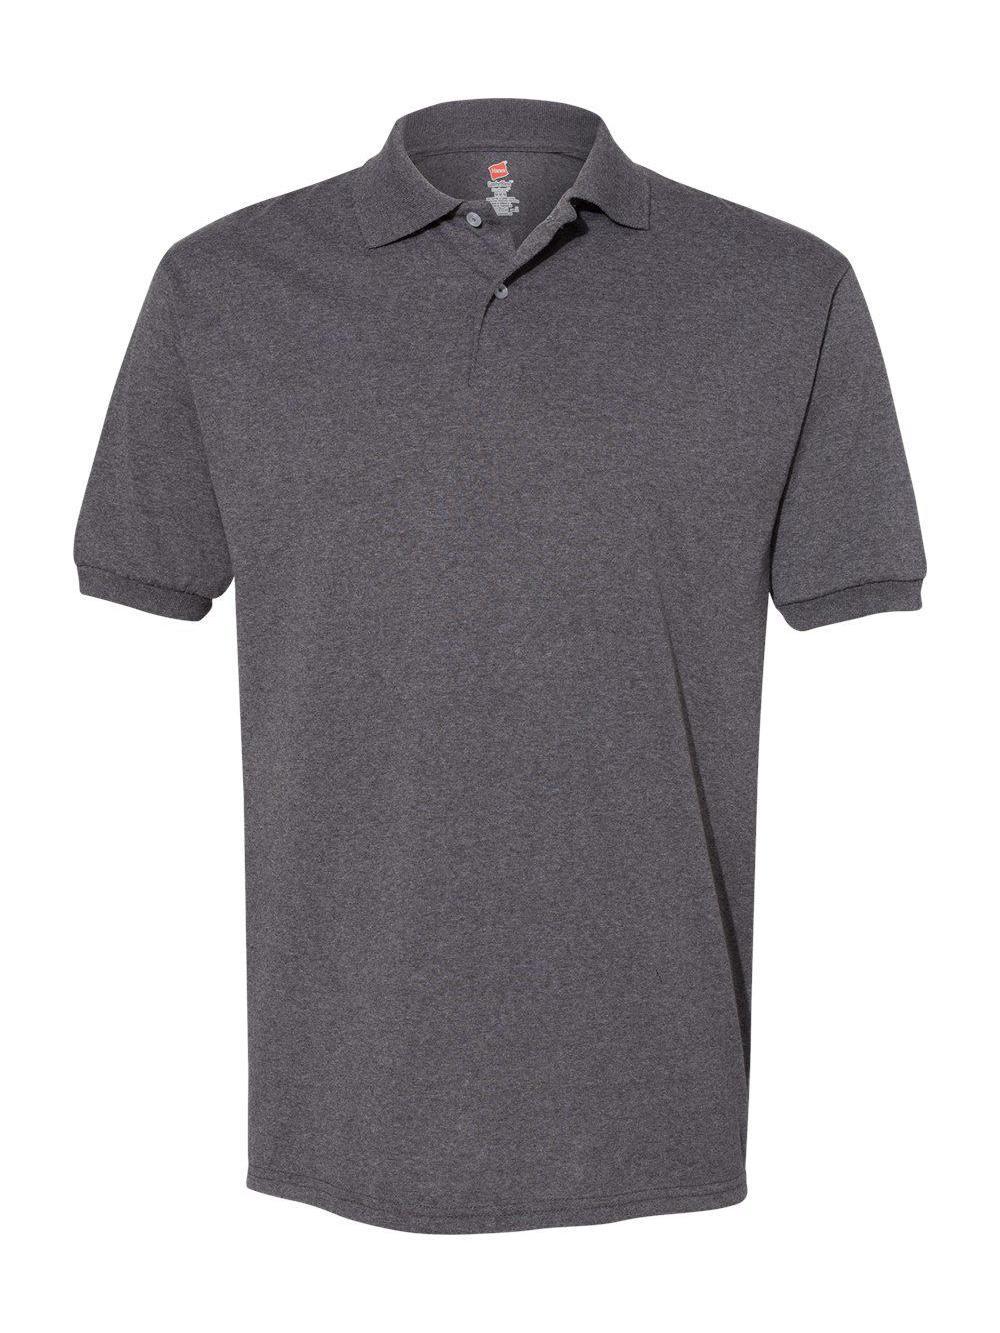 Hanes-Ecosmart-Jersey-Sport-Shirt-054X thumbnail 9